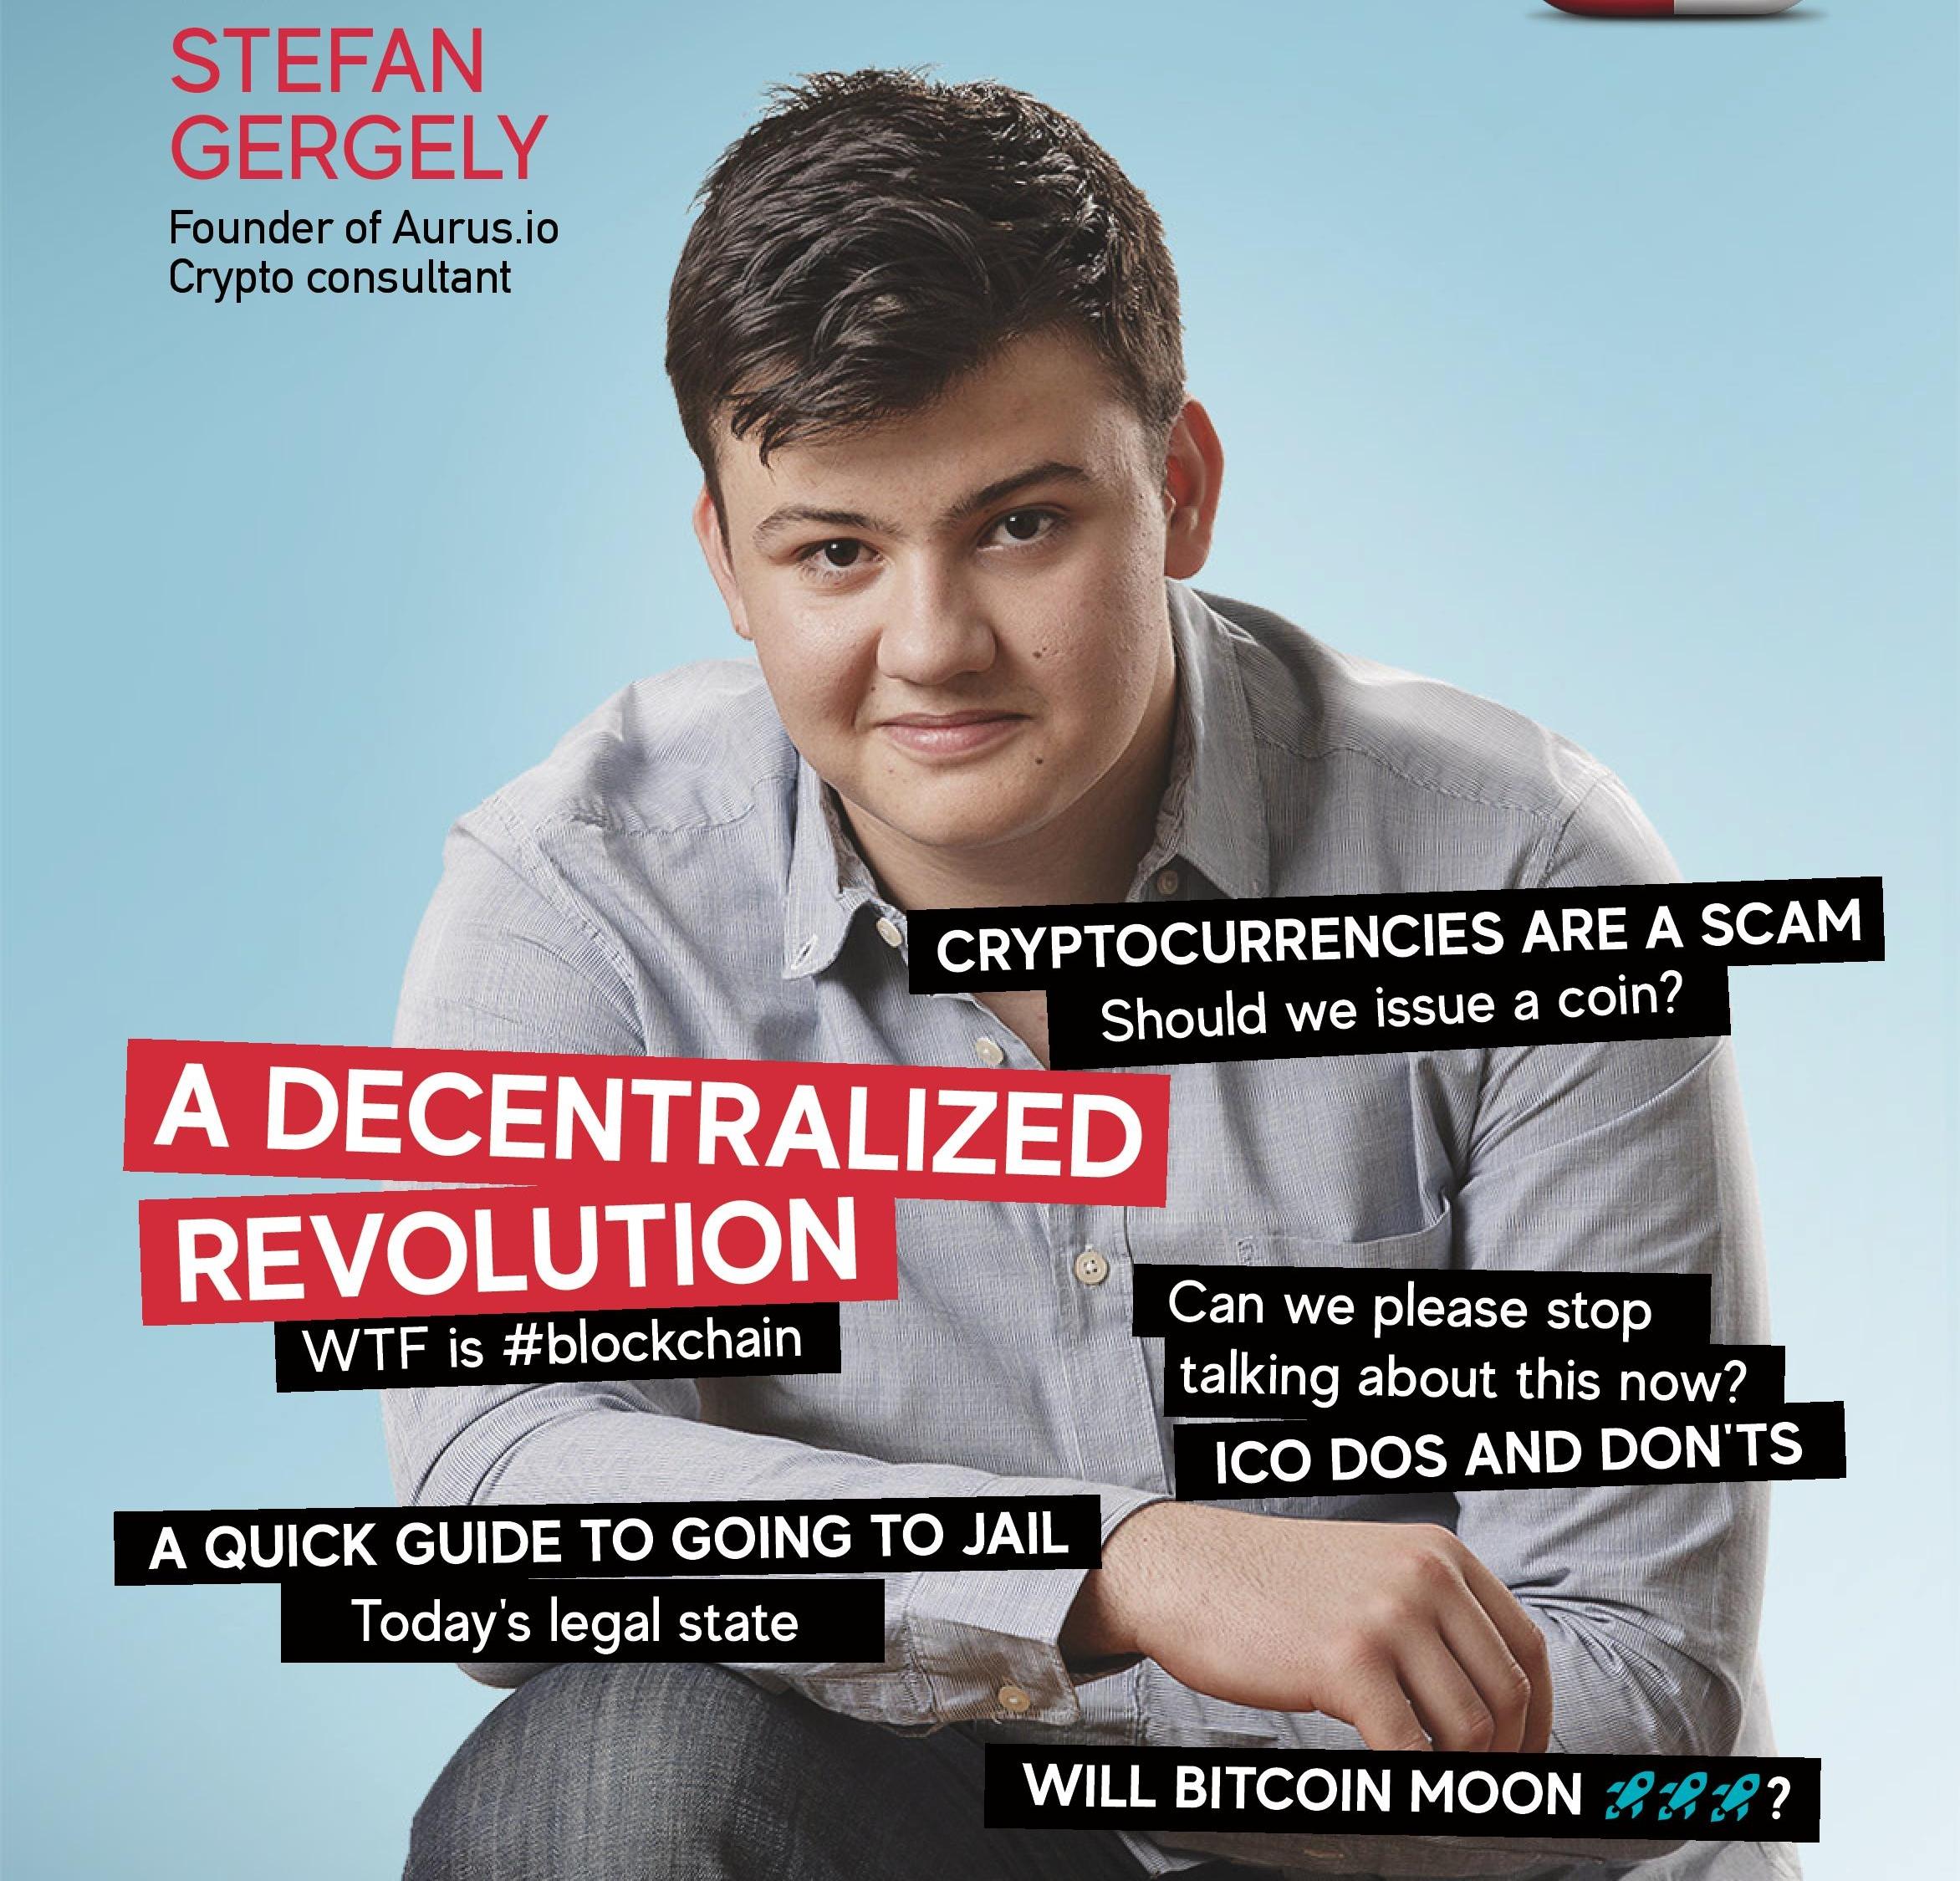 A decentralized revolution